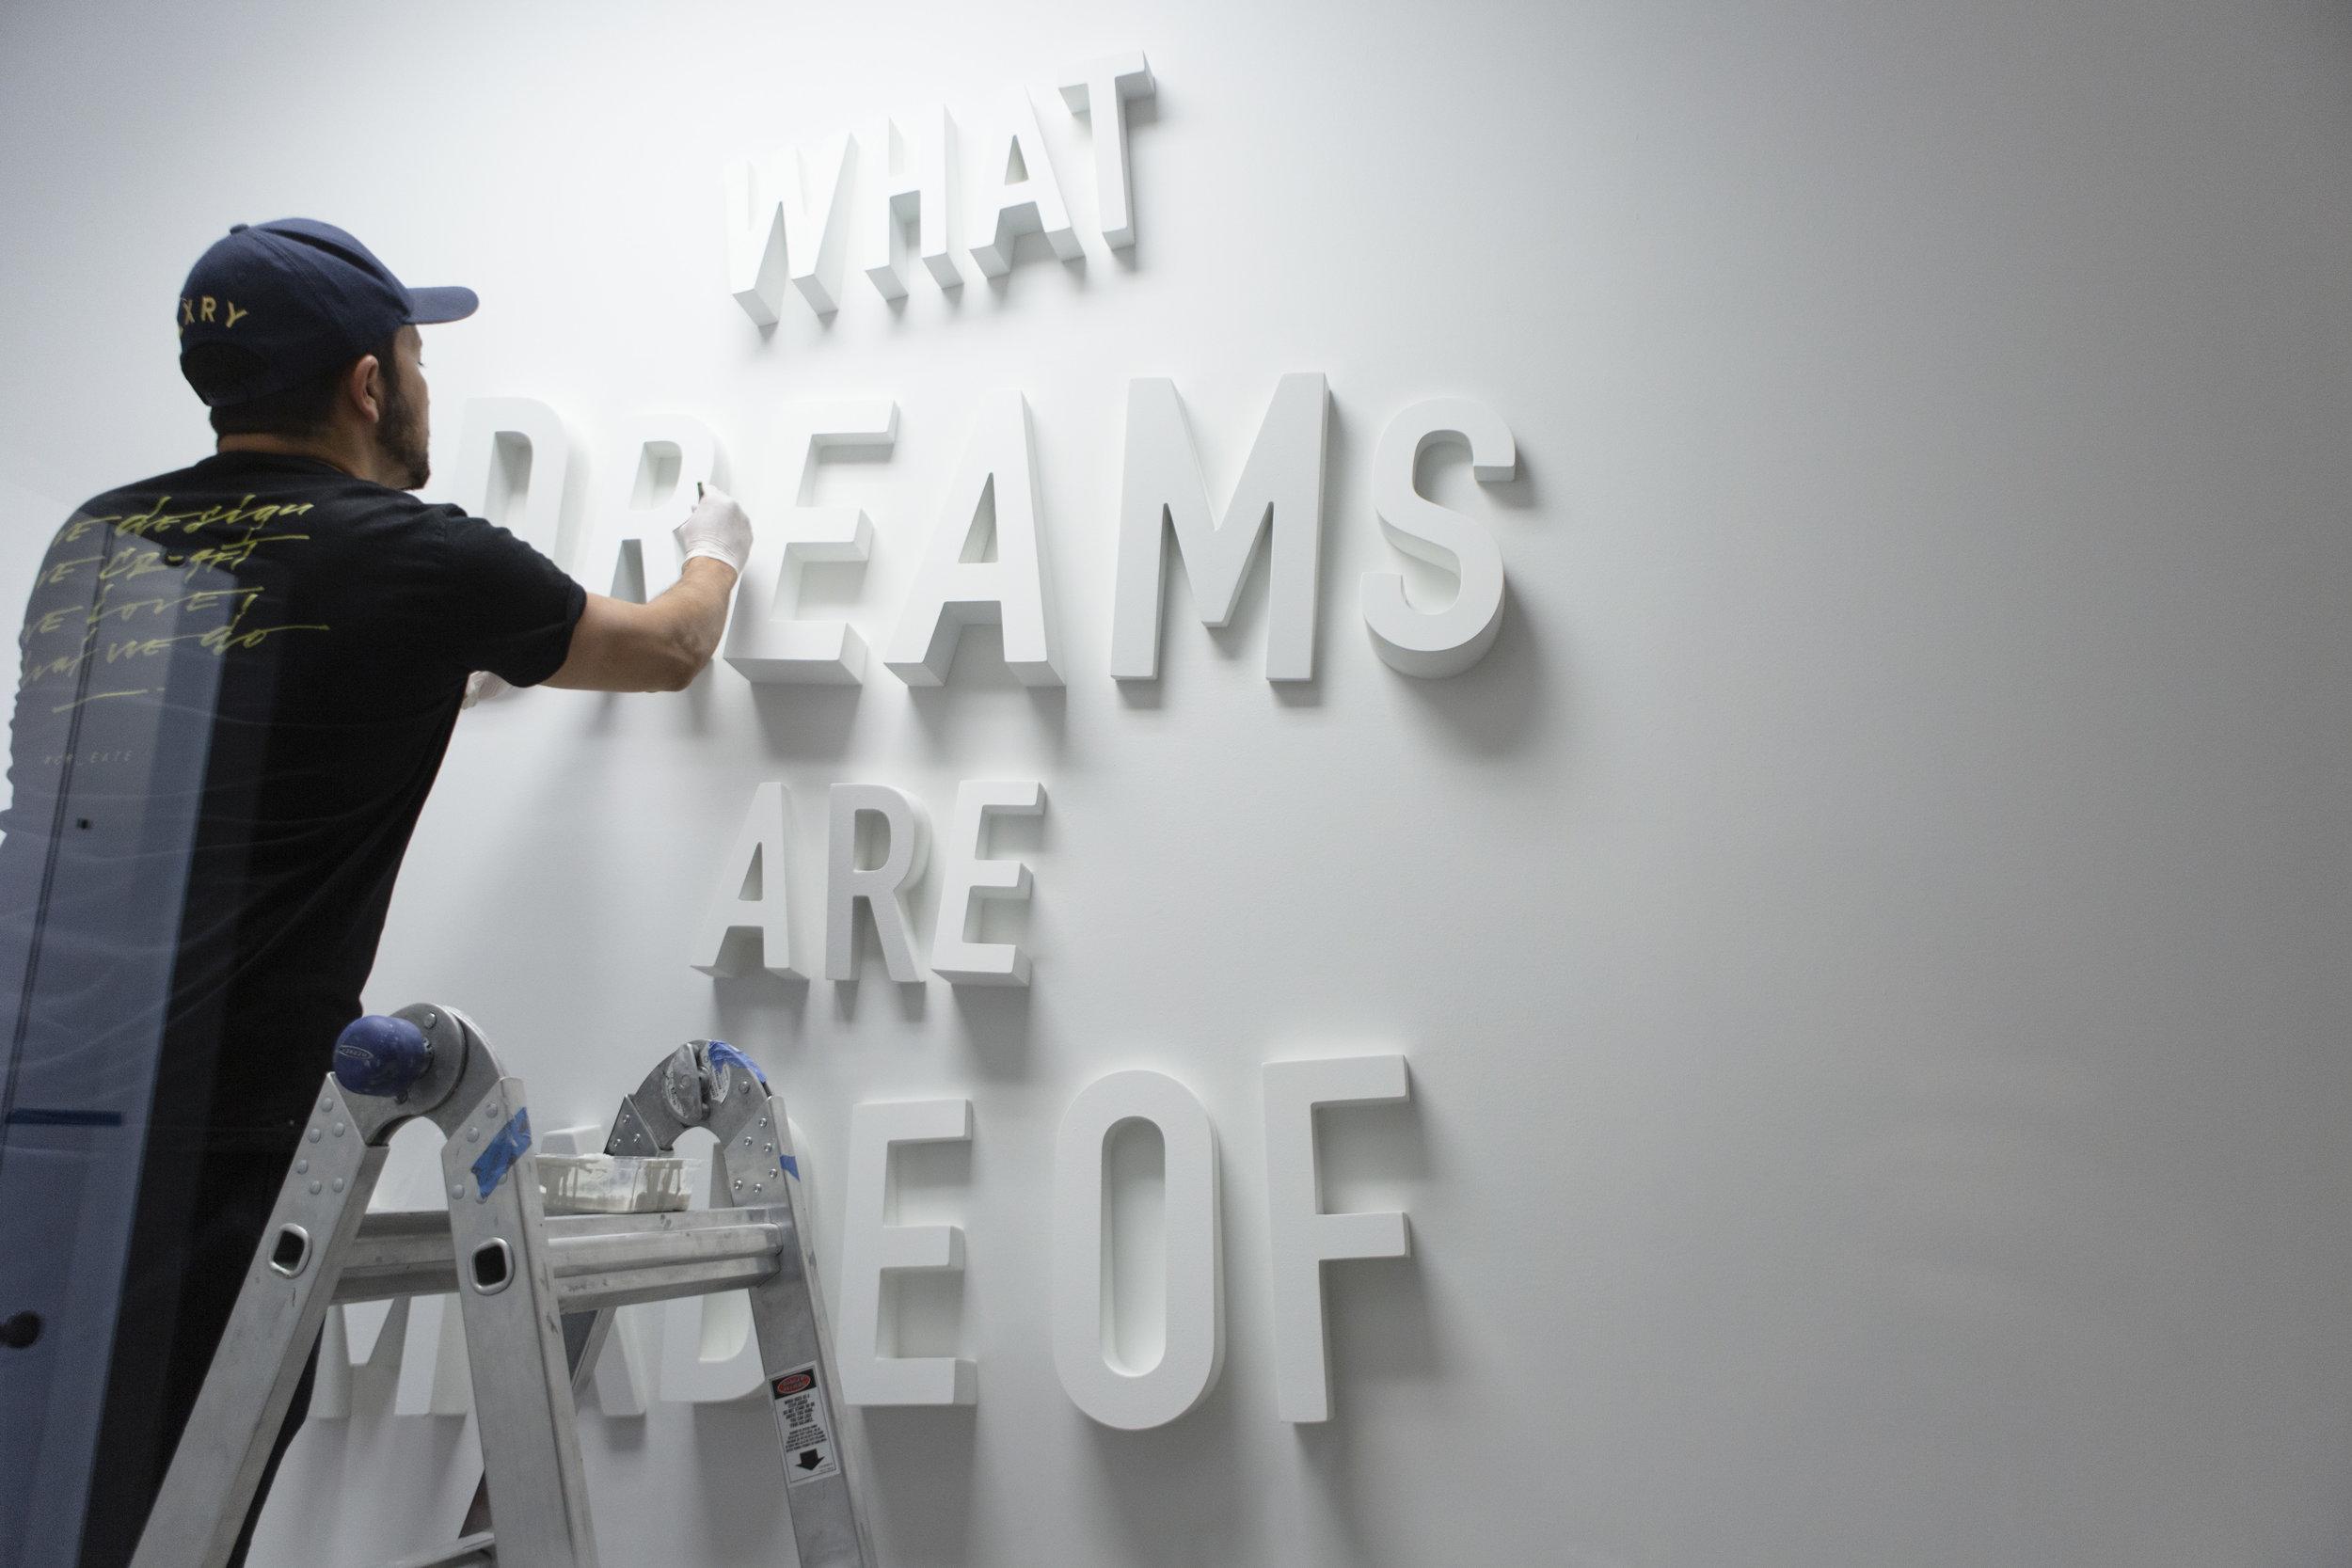 typography-art-camilo-rojas-dream (9).jpg